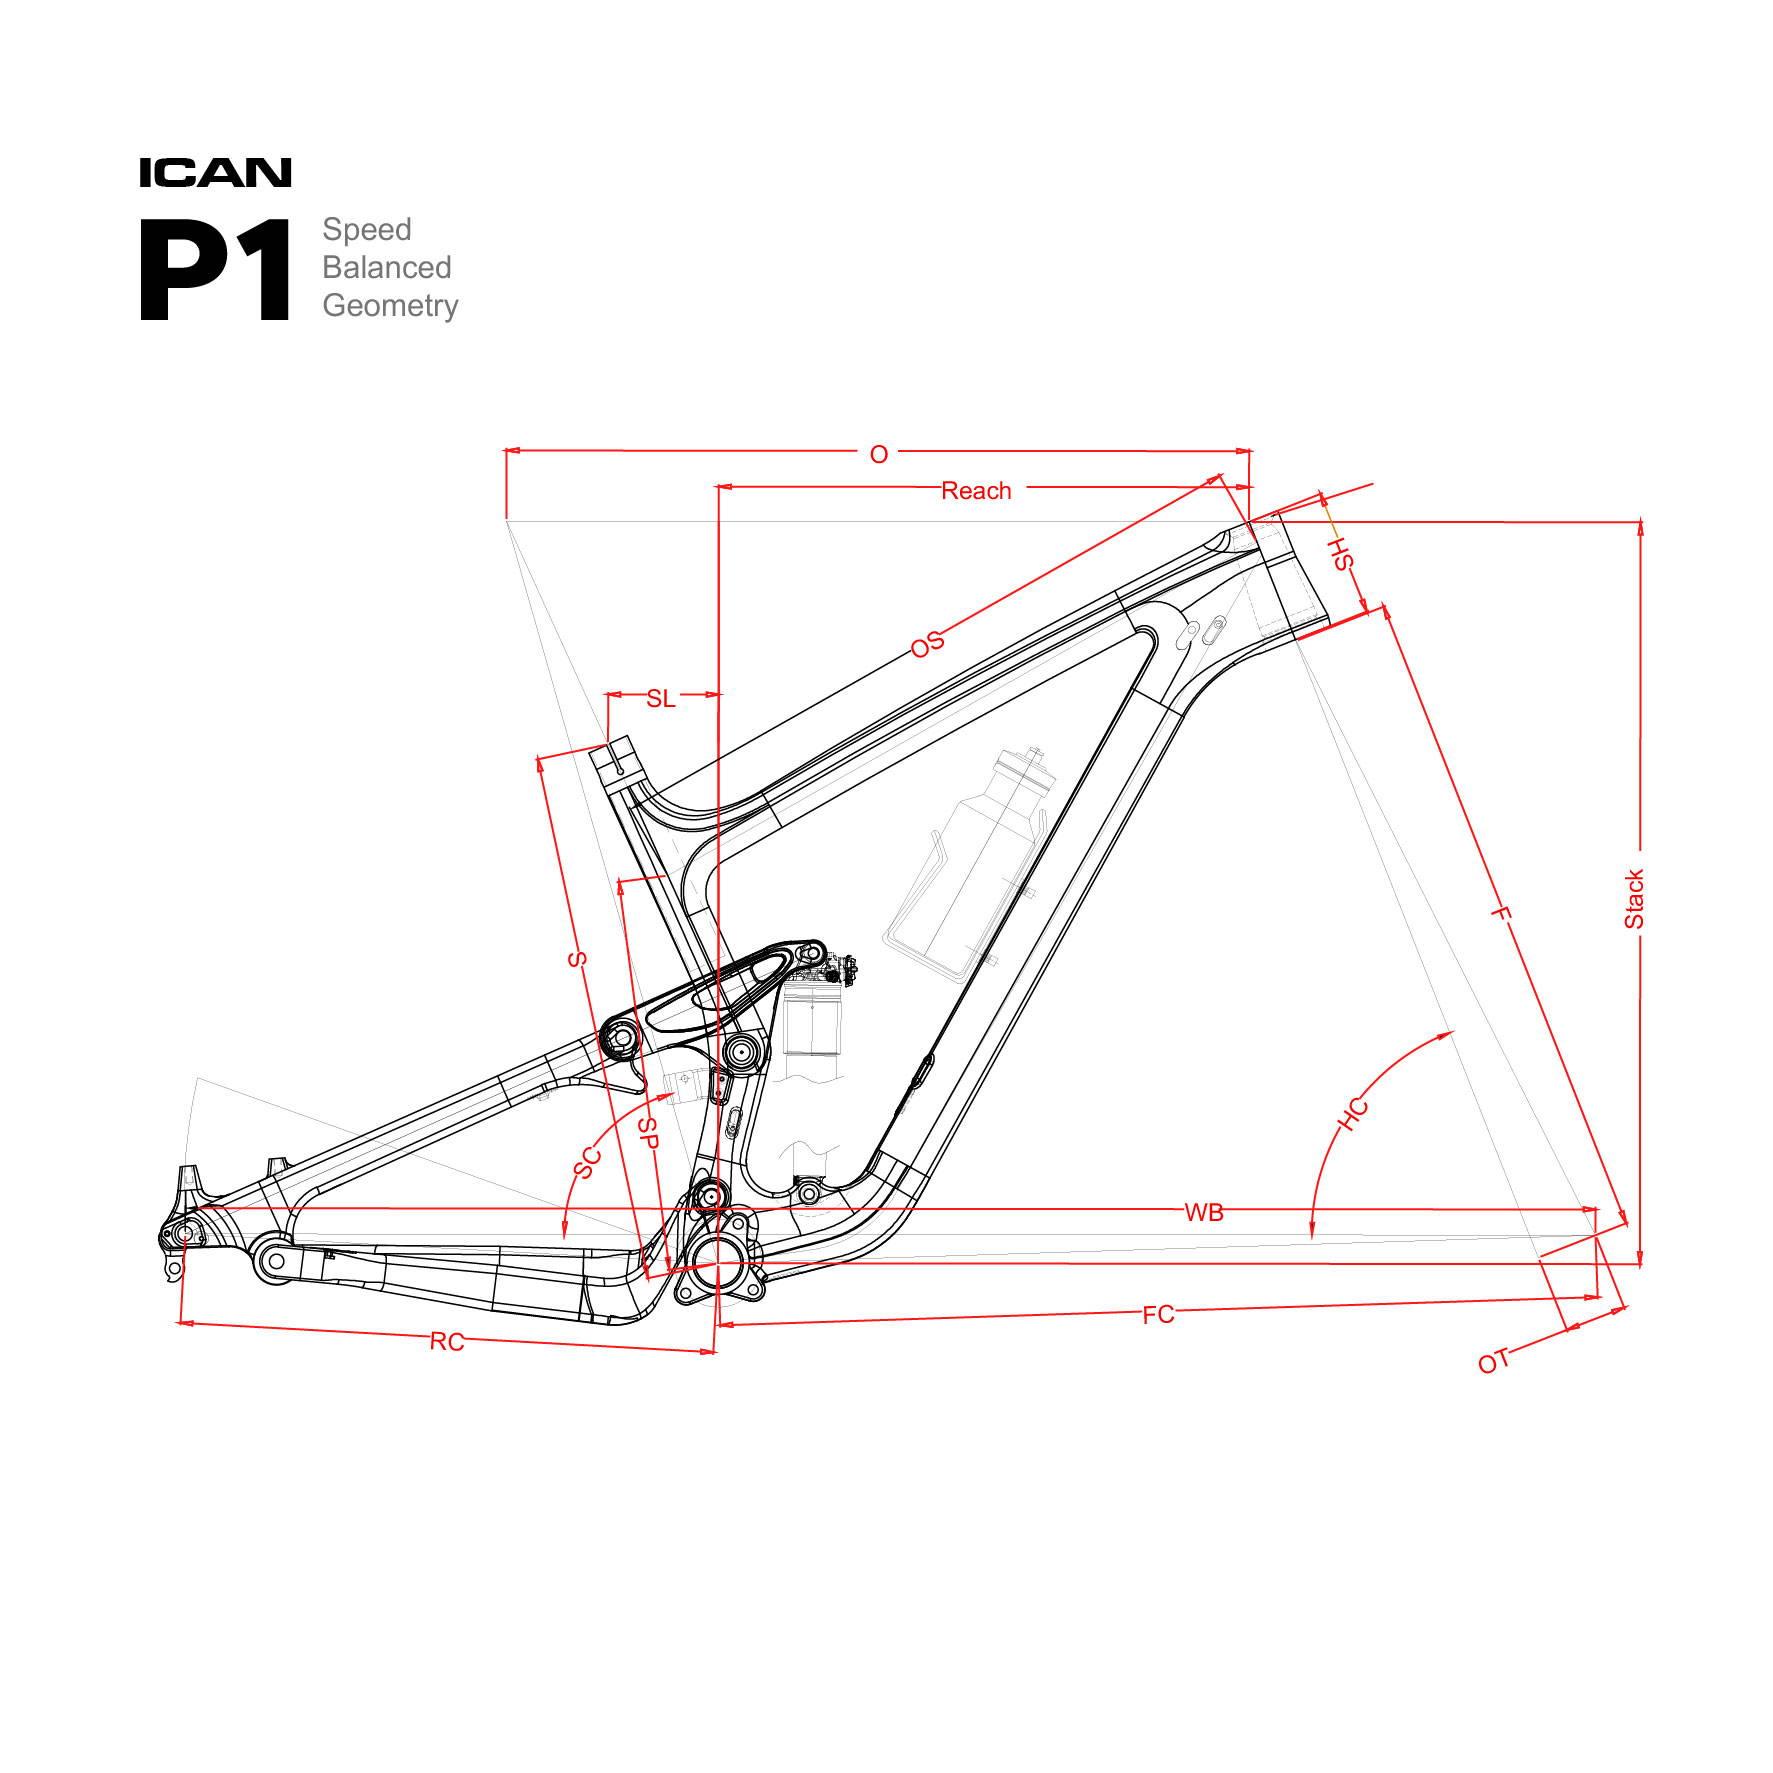 ICAN P1 Geometry